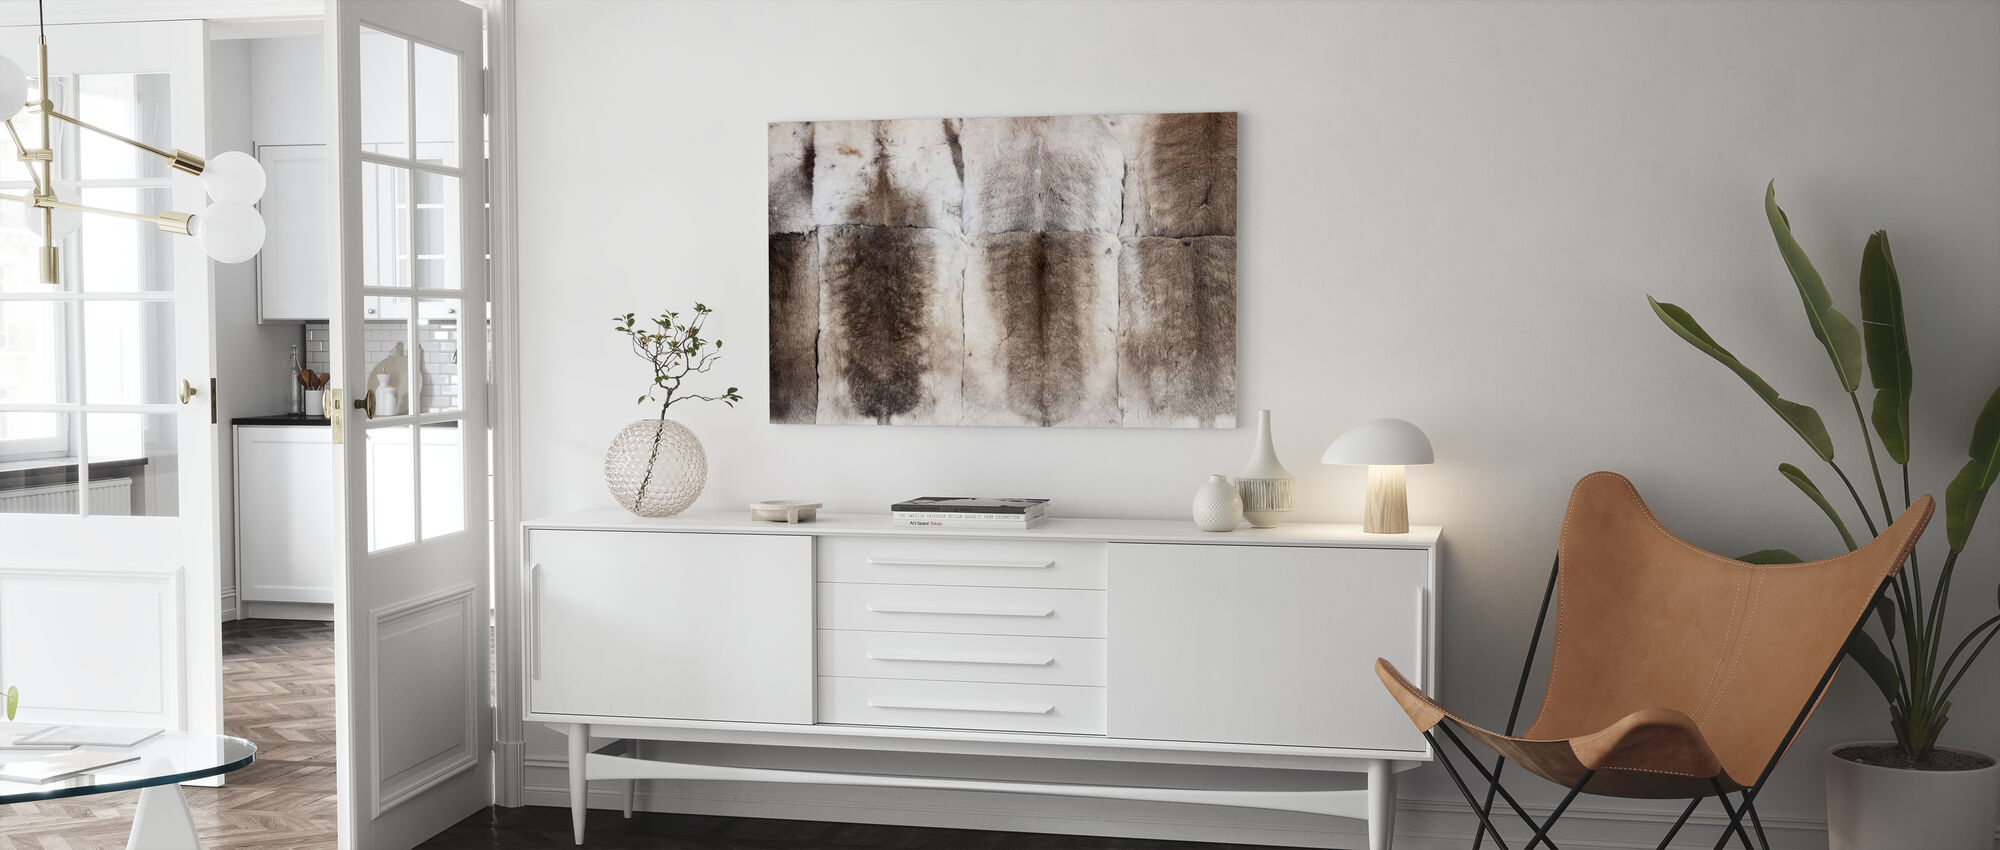 Reindeer Fell - Canvas print - Living Room